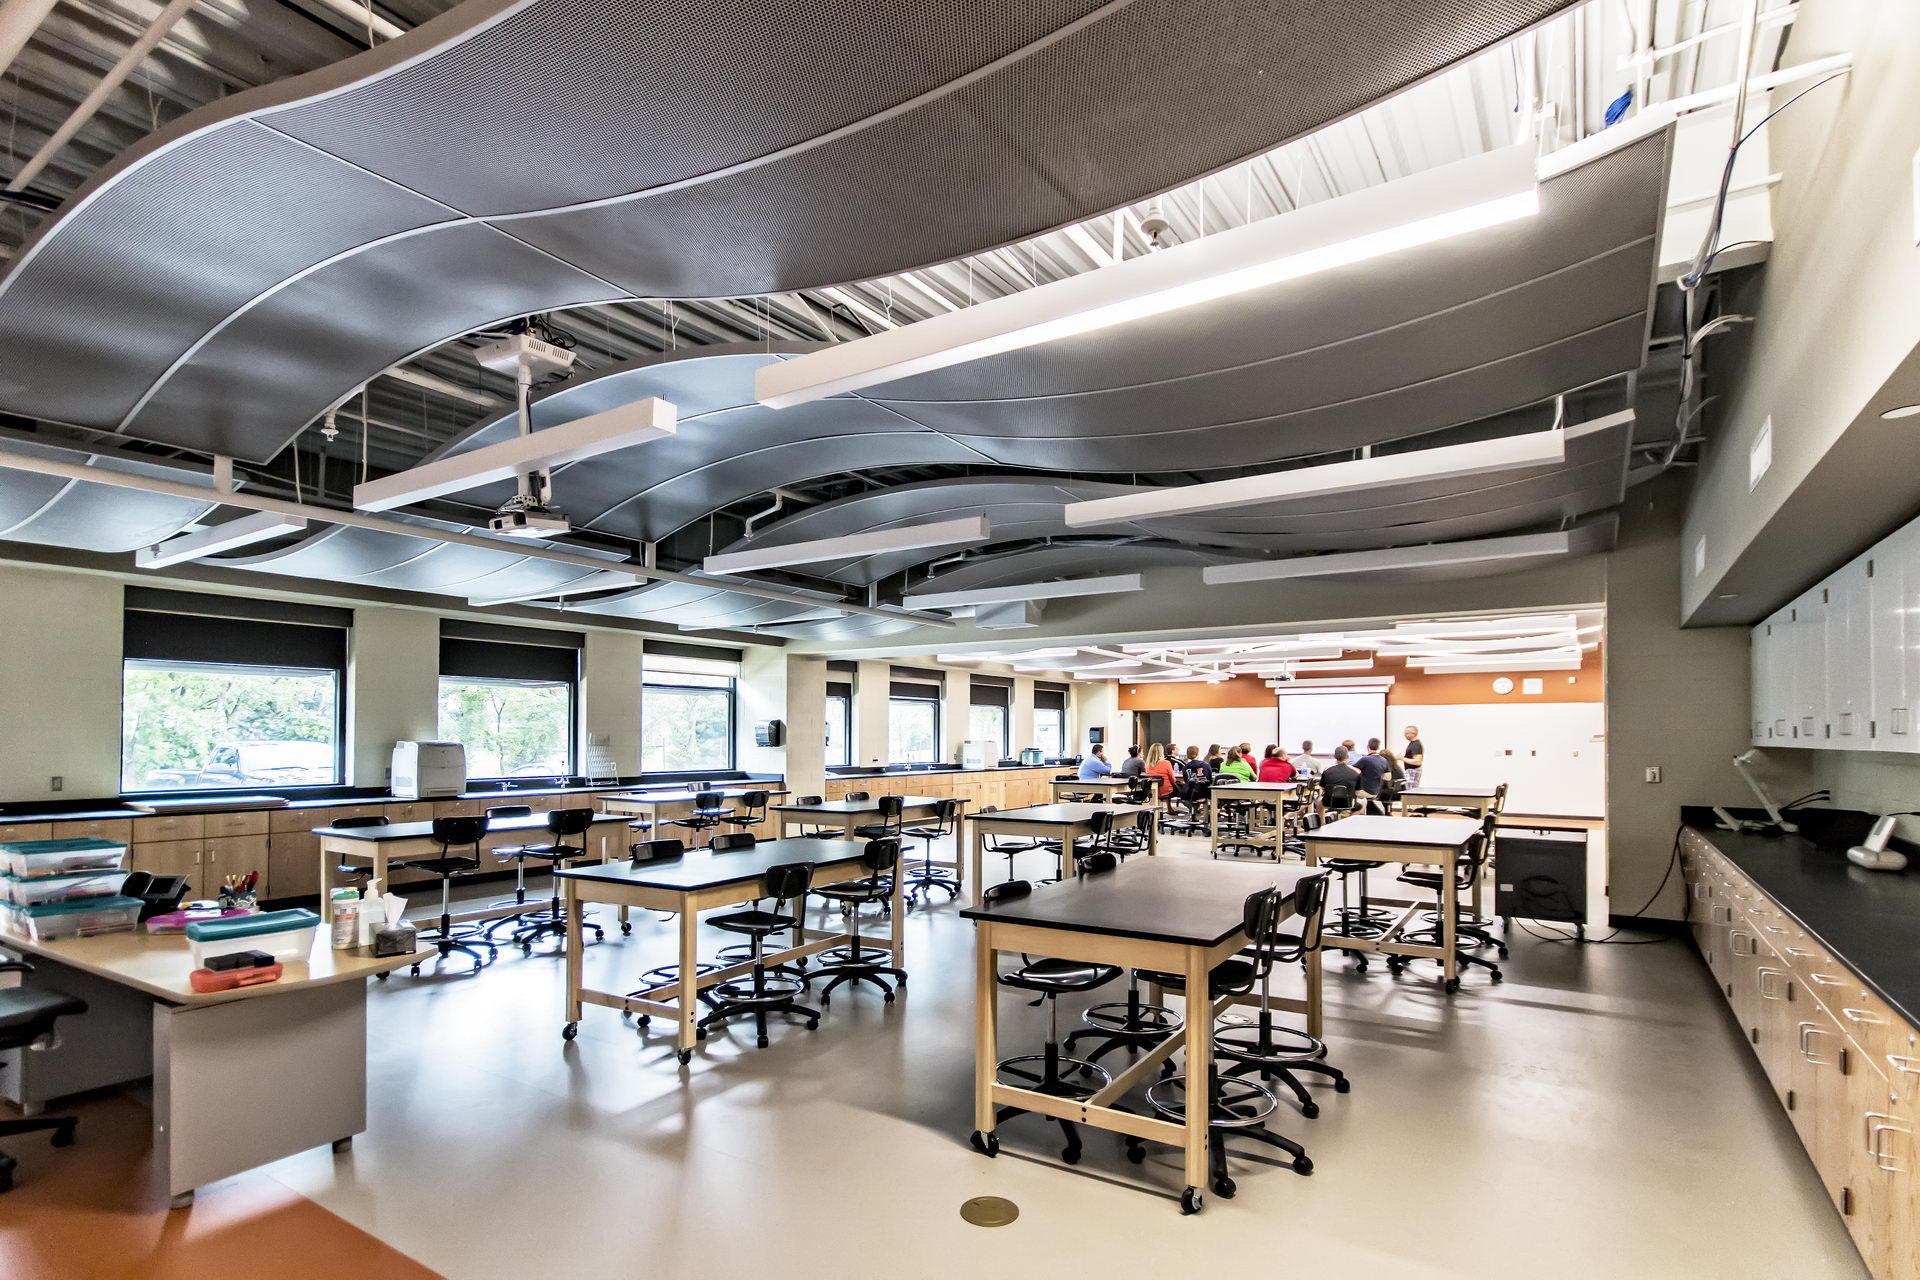 High School Science Classroom Design ~ Dla architects shepard high school science classroom